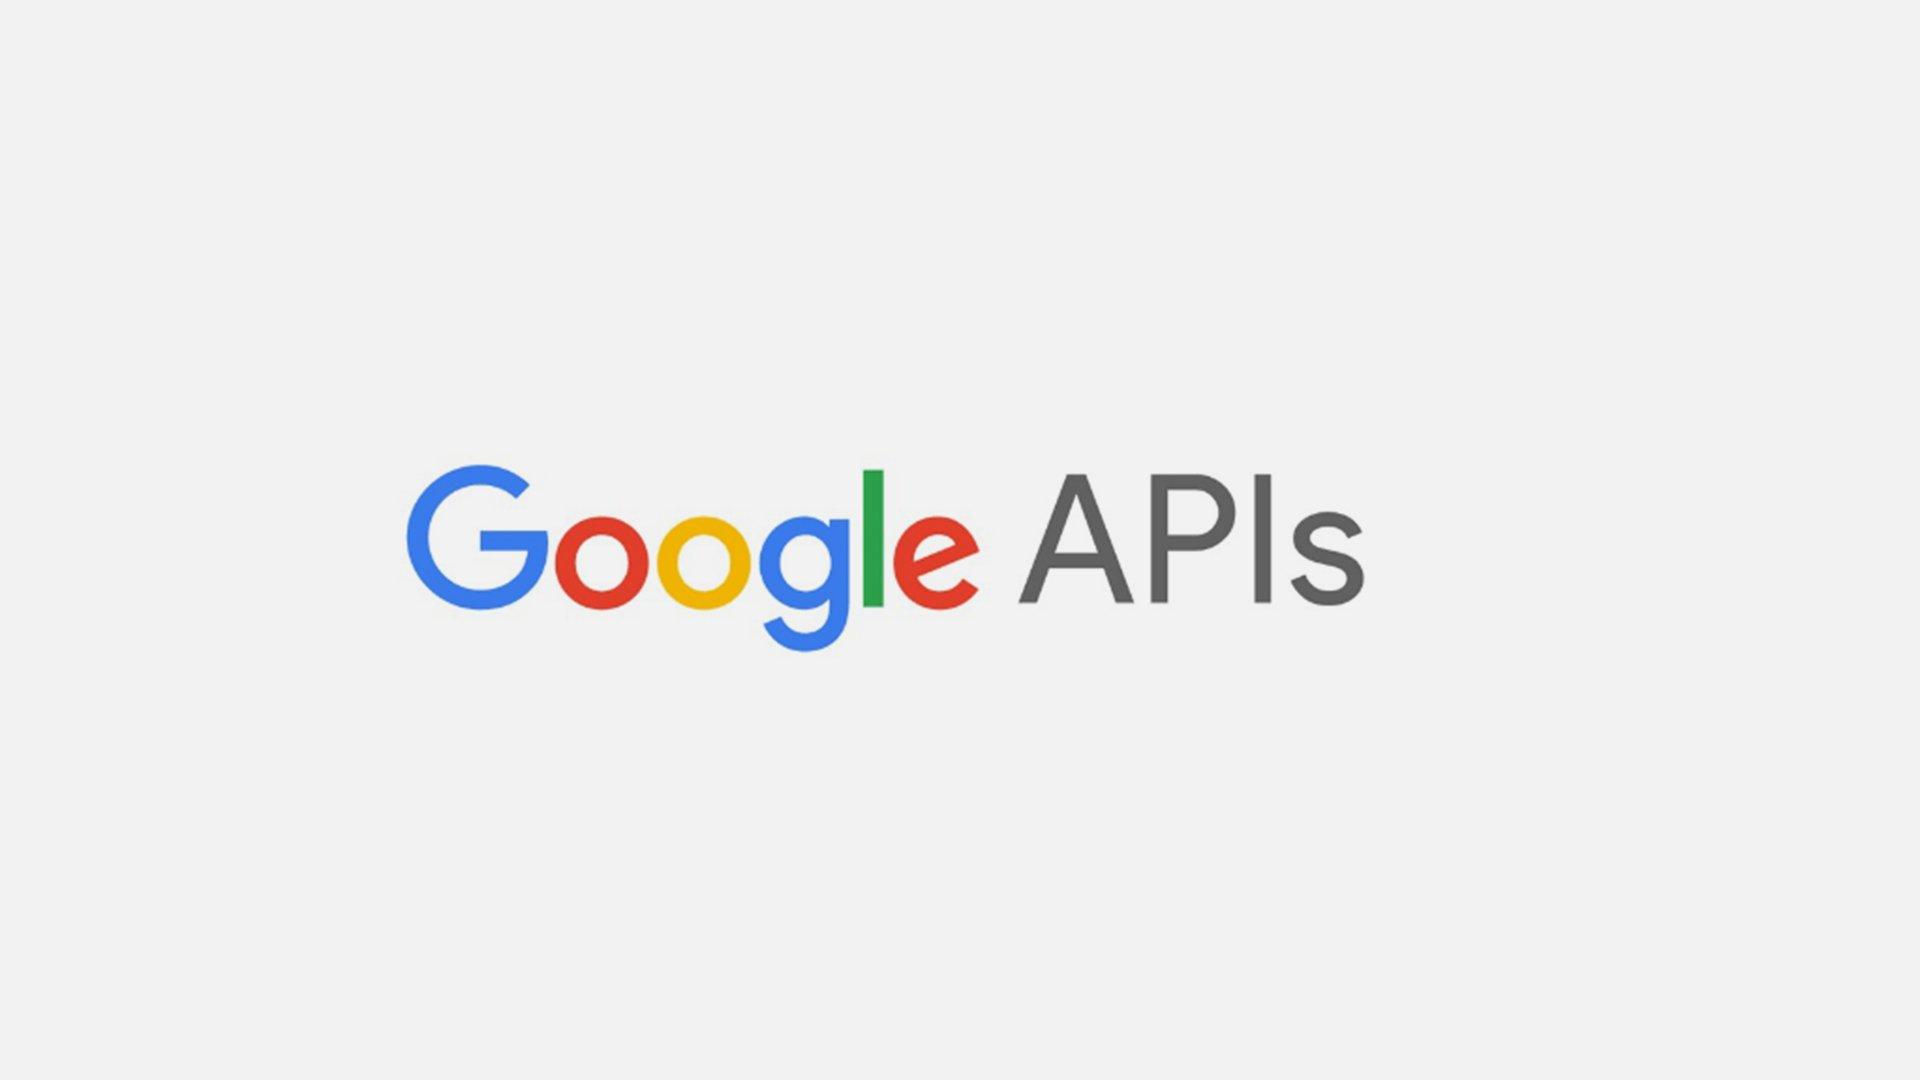 Collegamenti Google APIs